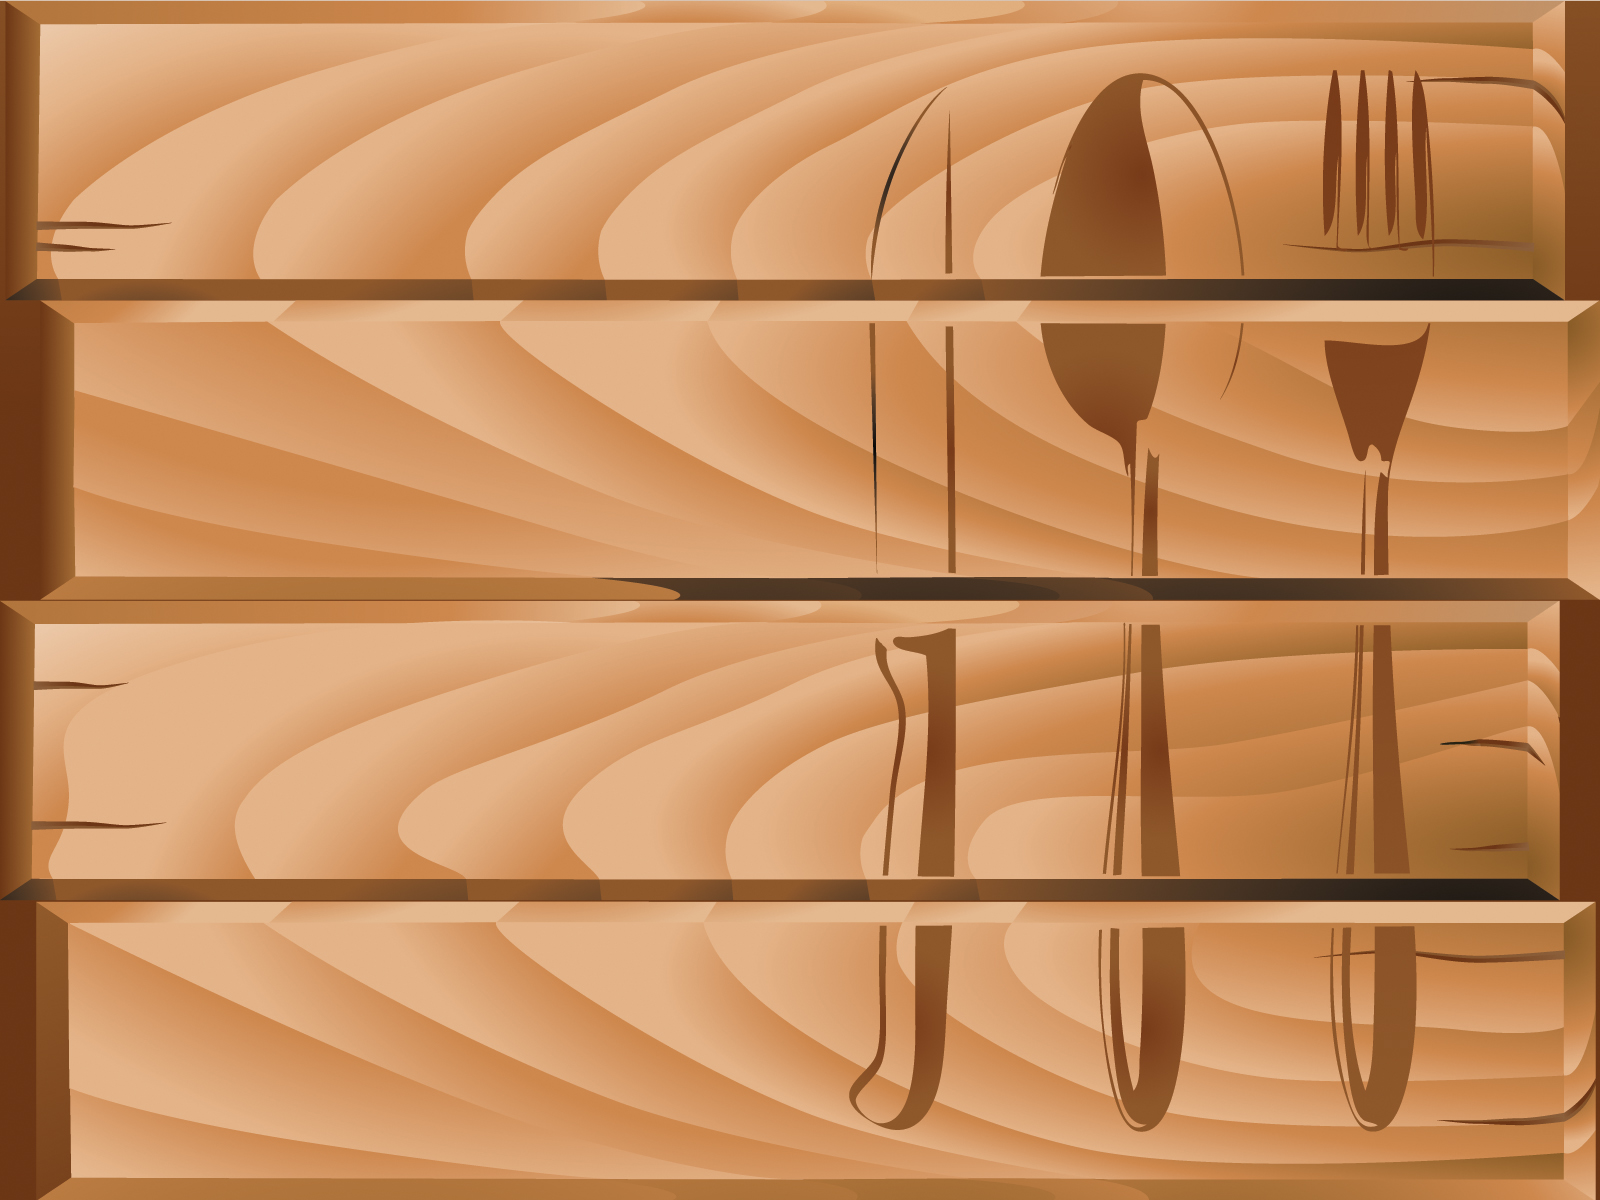 Restaurant-Menu-Theme-Backgrounds - Dionysos Central Hotel ...